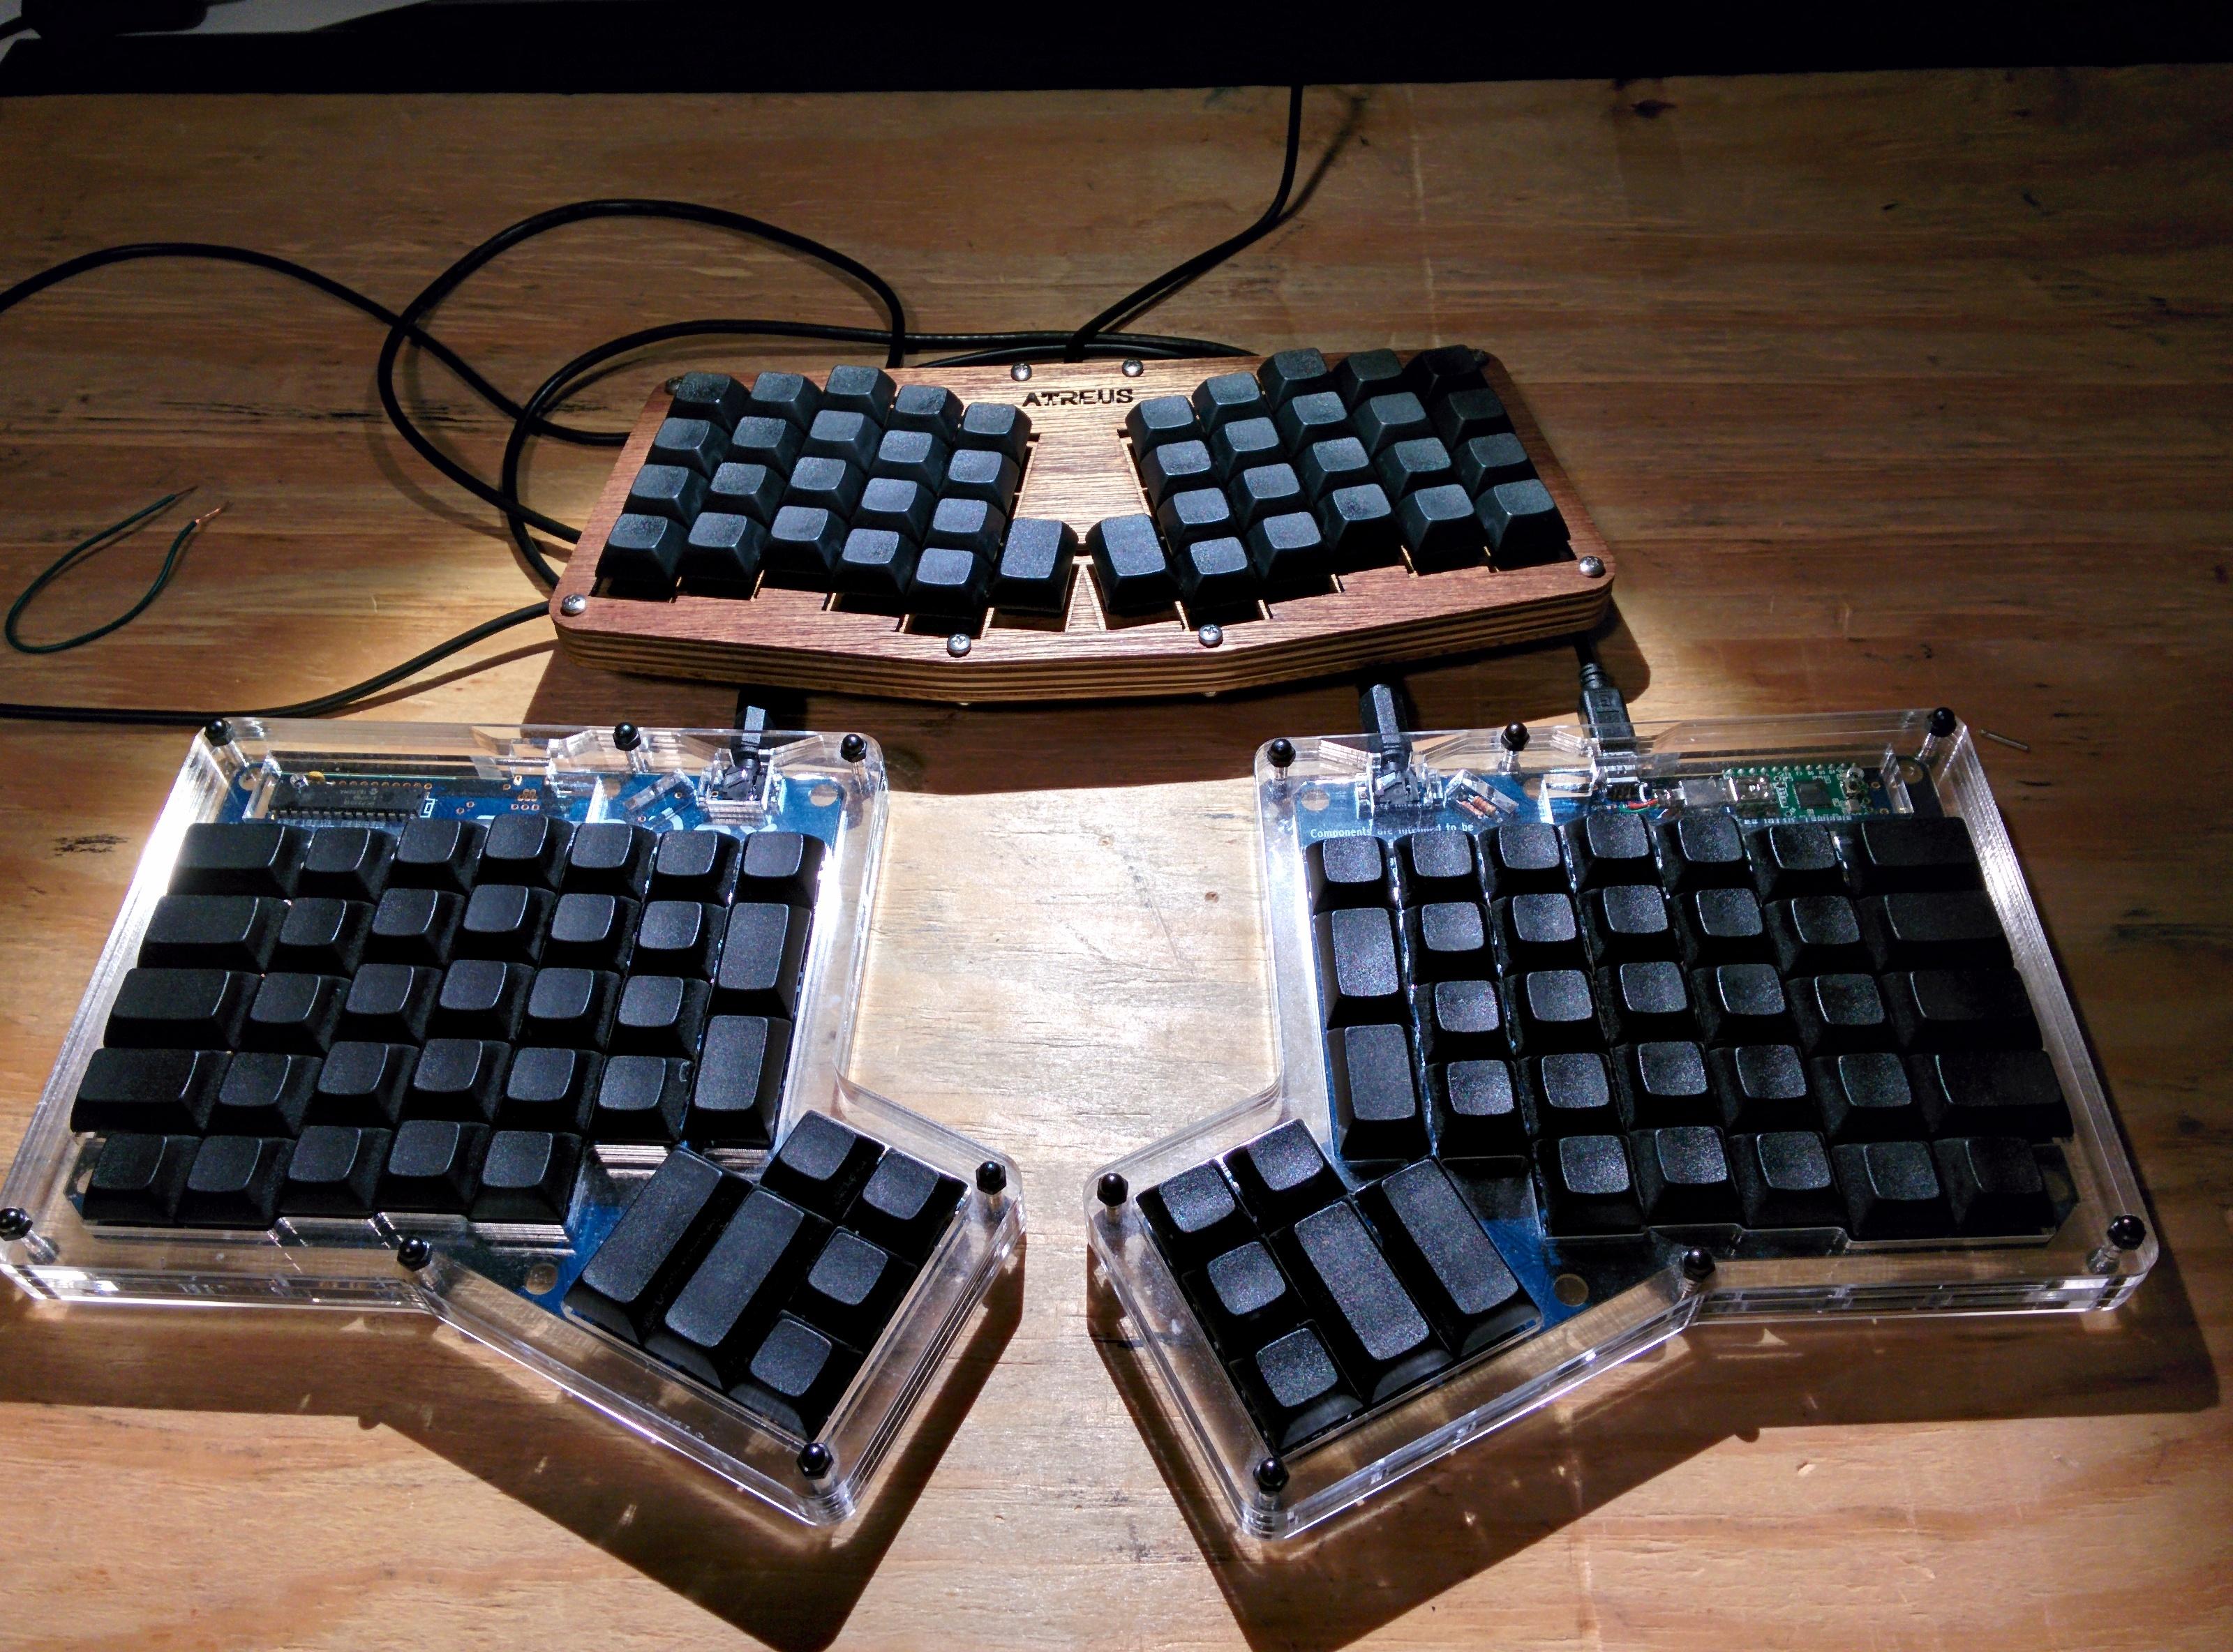 Atreus and ErgoDox custom keyboards